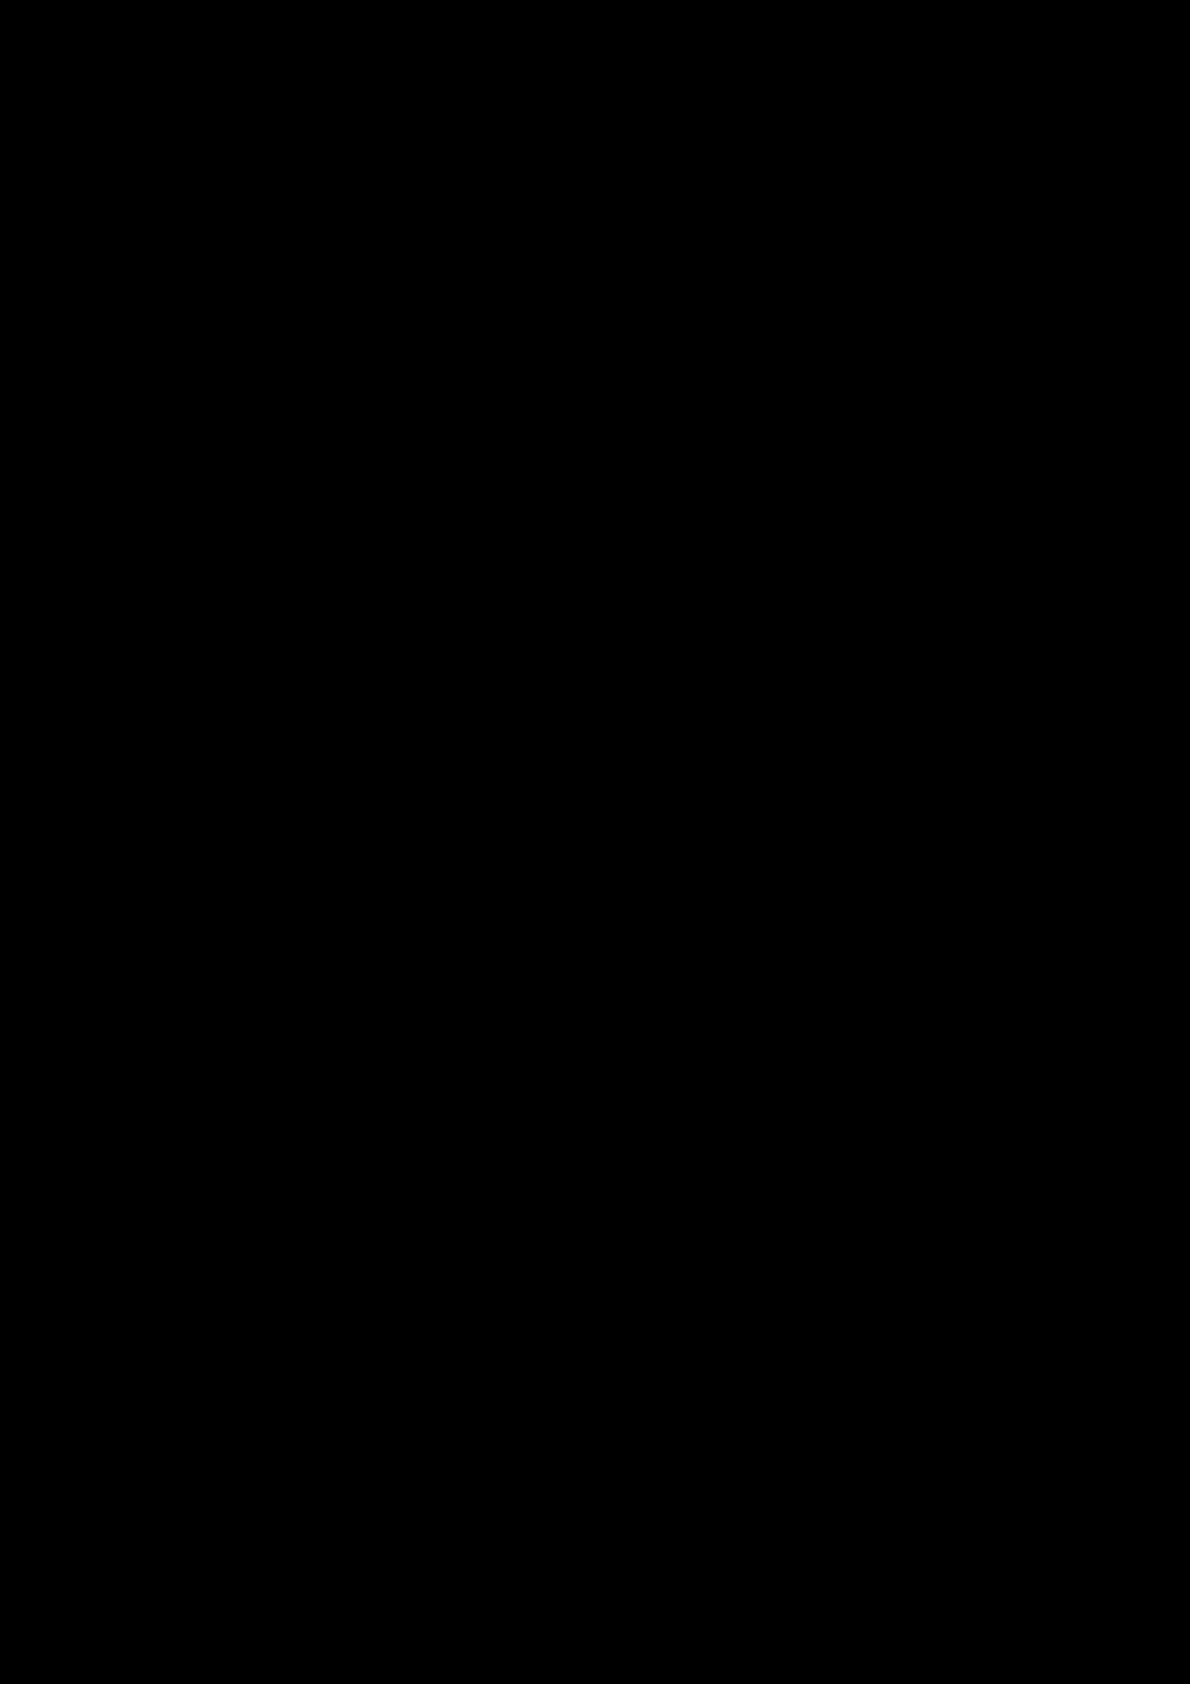 Autopia-presenta/specimen-autopia-b-light.png